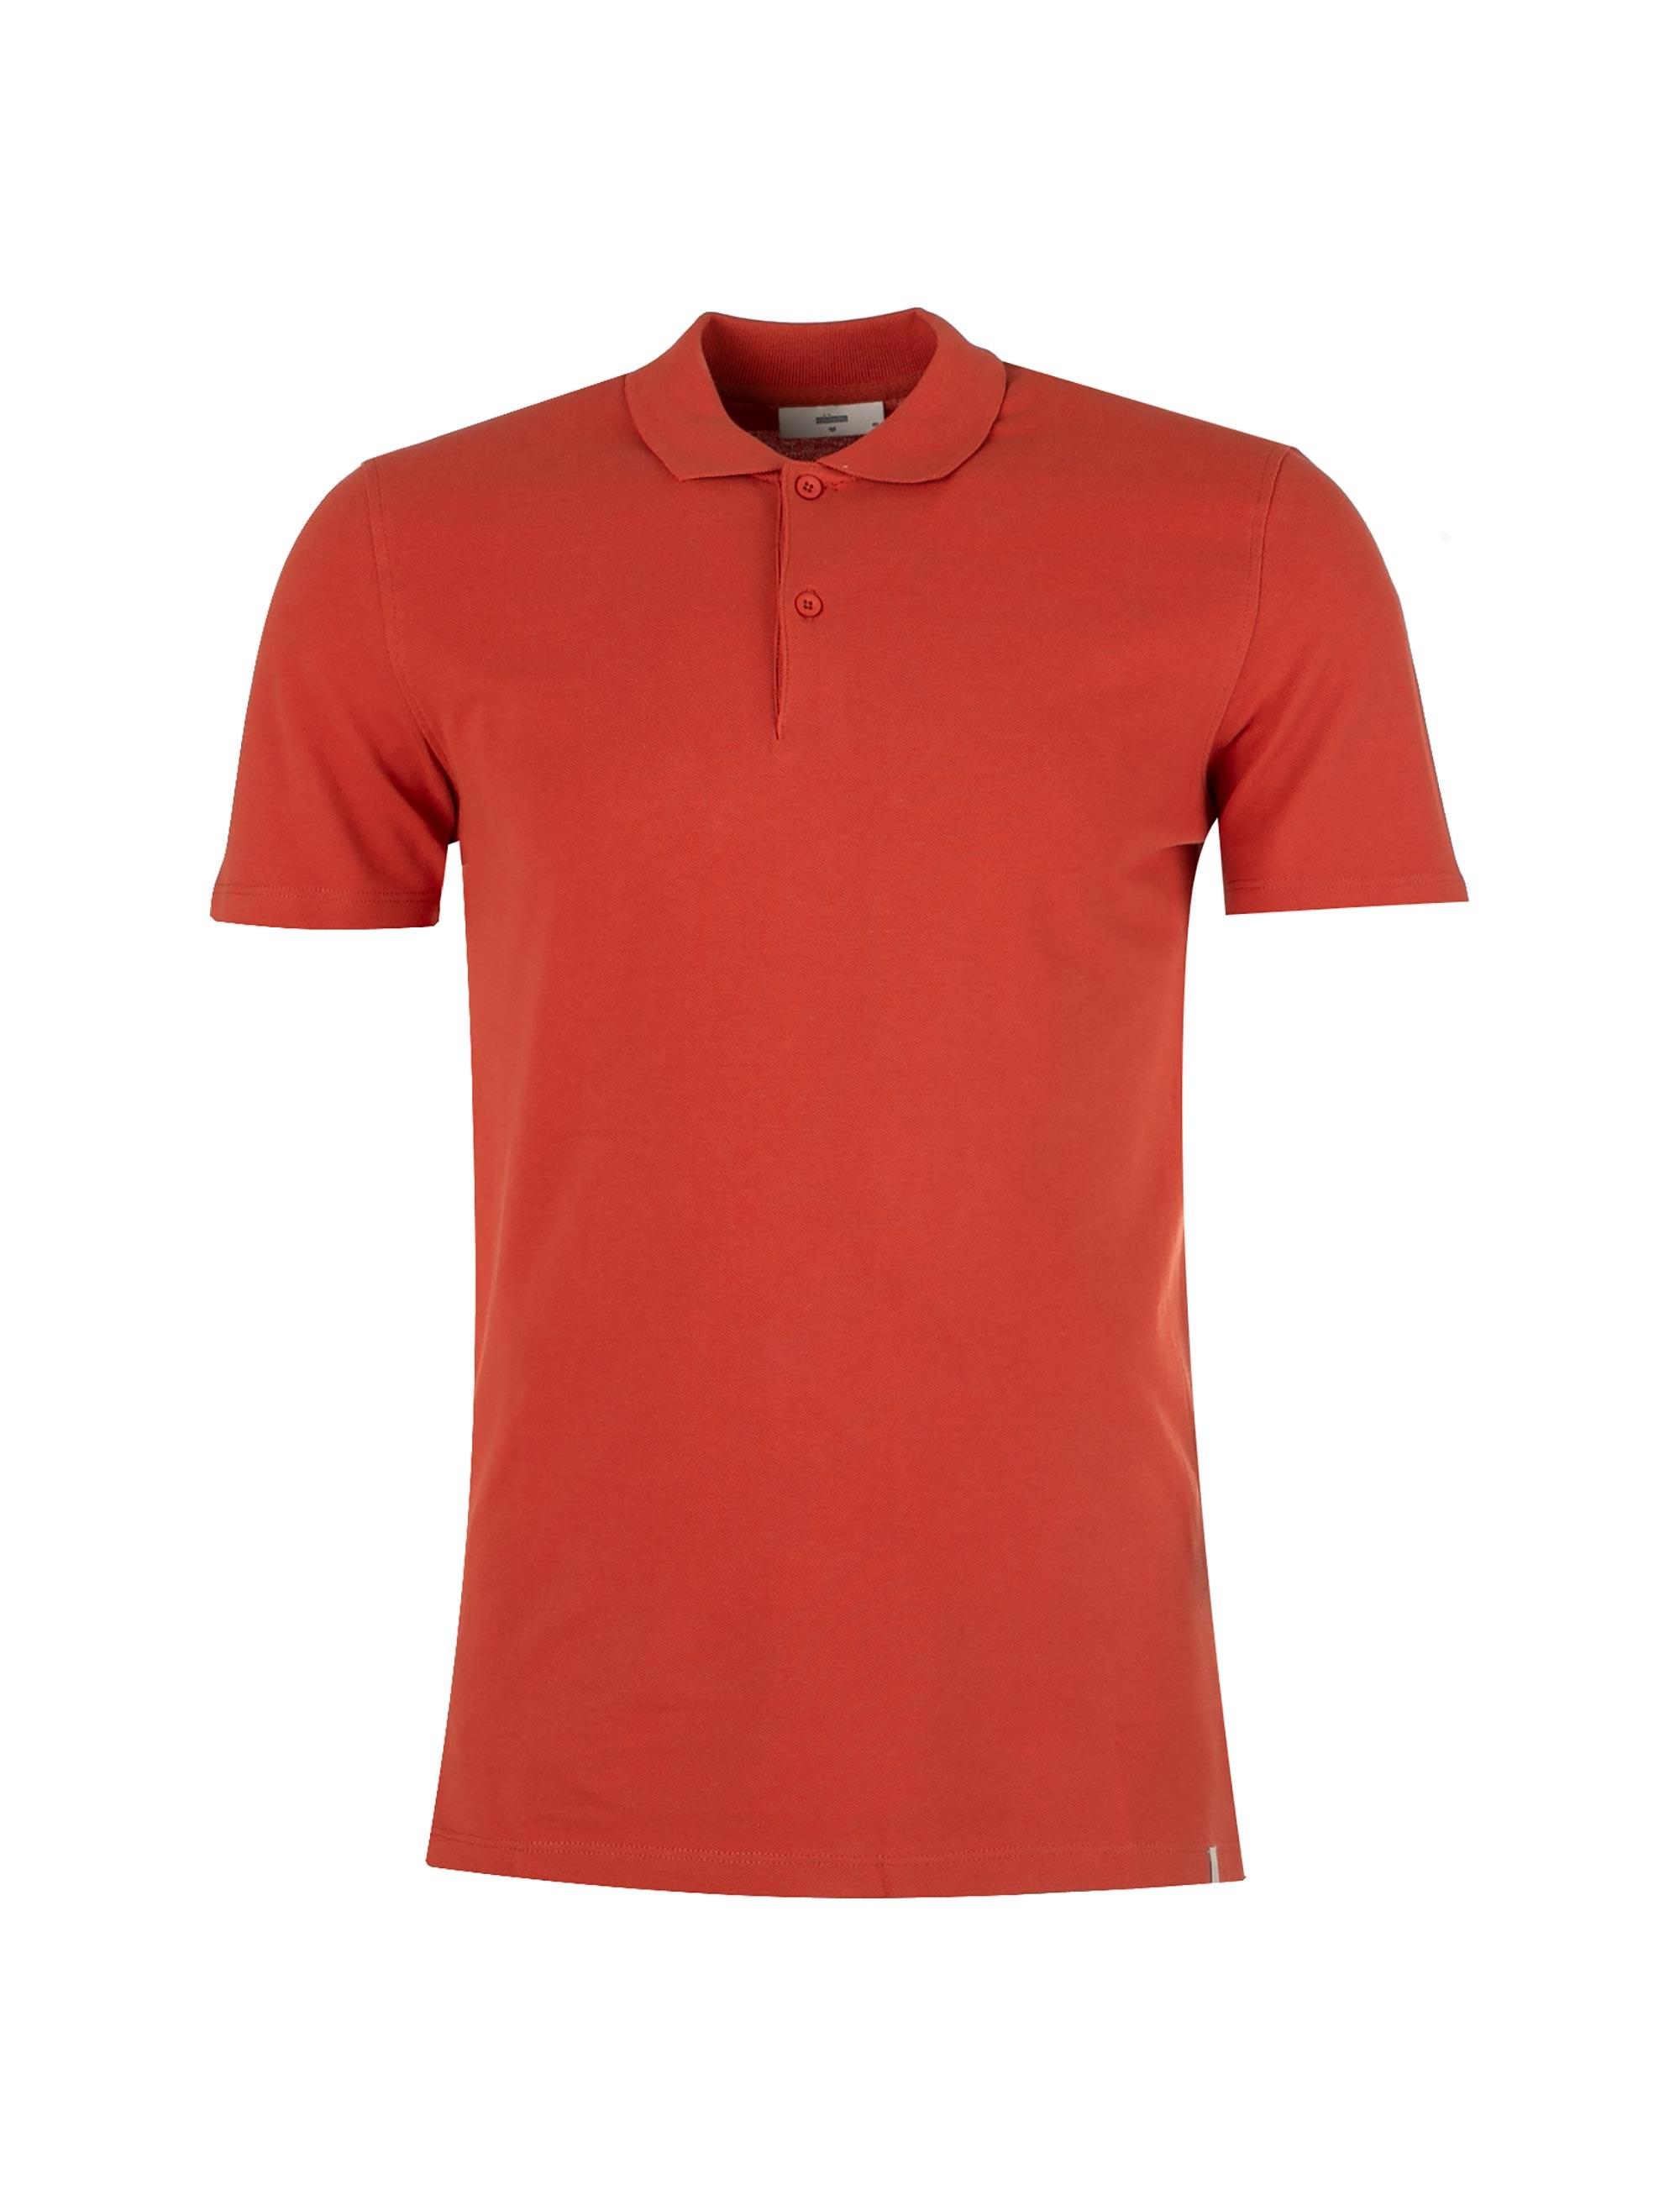 تی شرت نخی مردانه Tarik - مینیموم